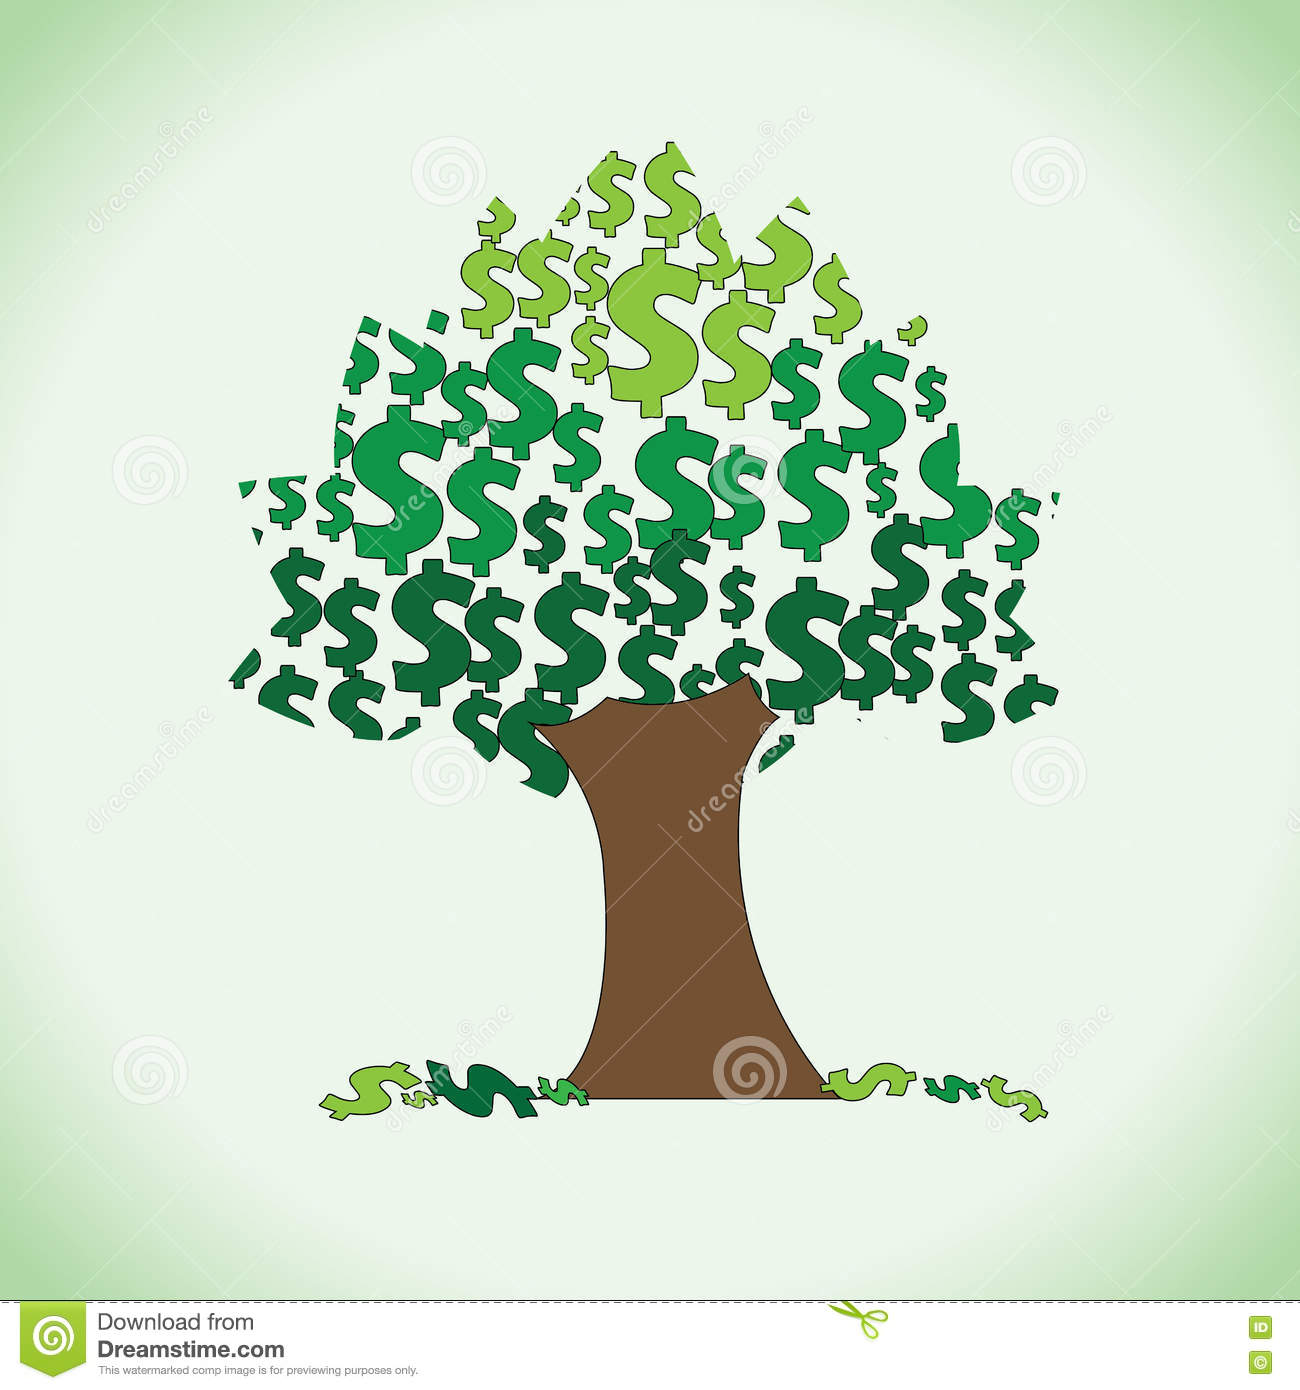 Big dollar tree clipart stock vector. Illustration of dollars.